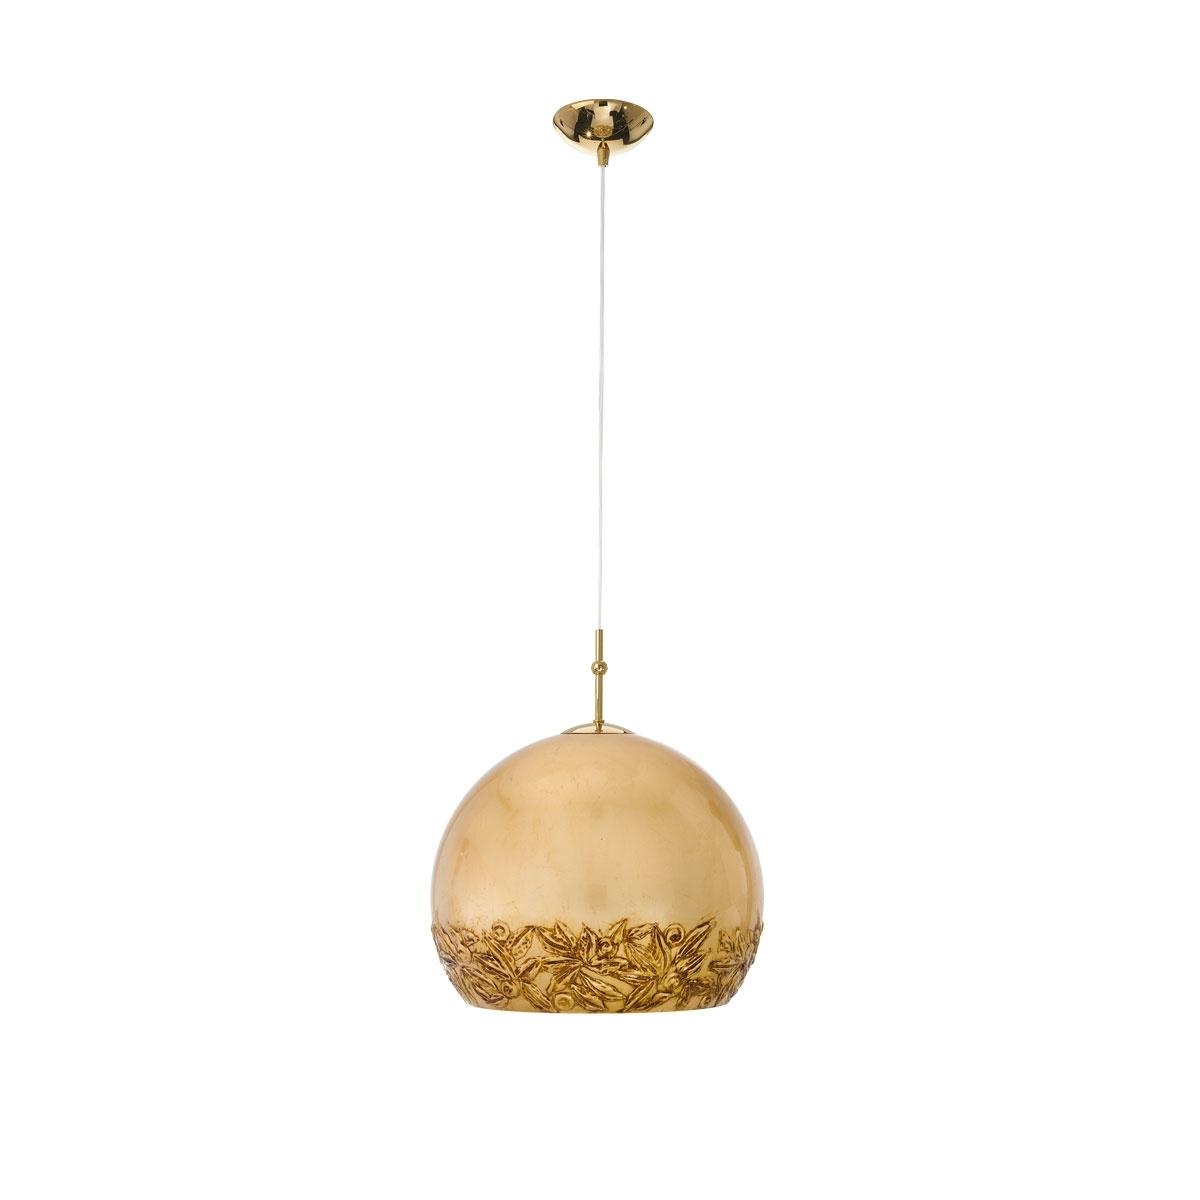 kolarz-pendelleuchte-luna-pl-gold-glas-metall-0392-31m-3-li-ga